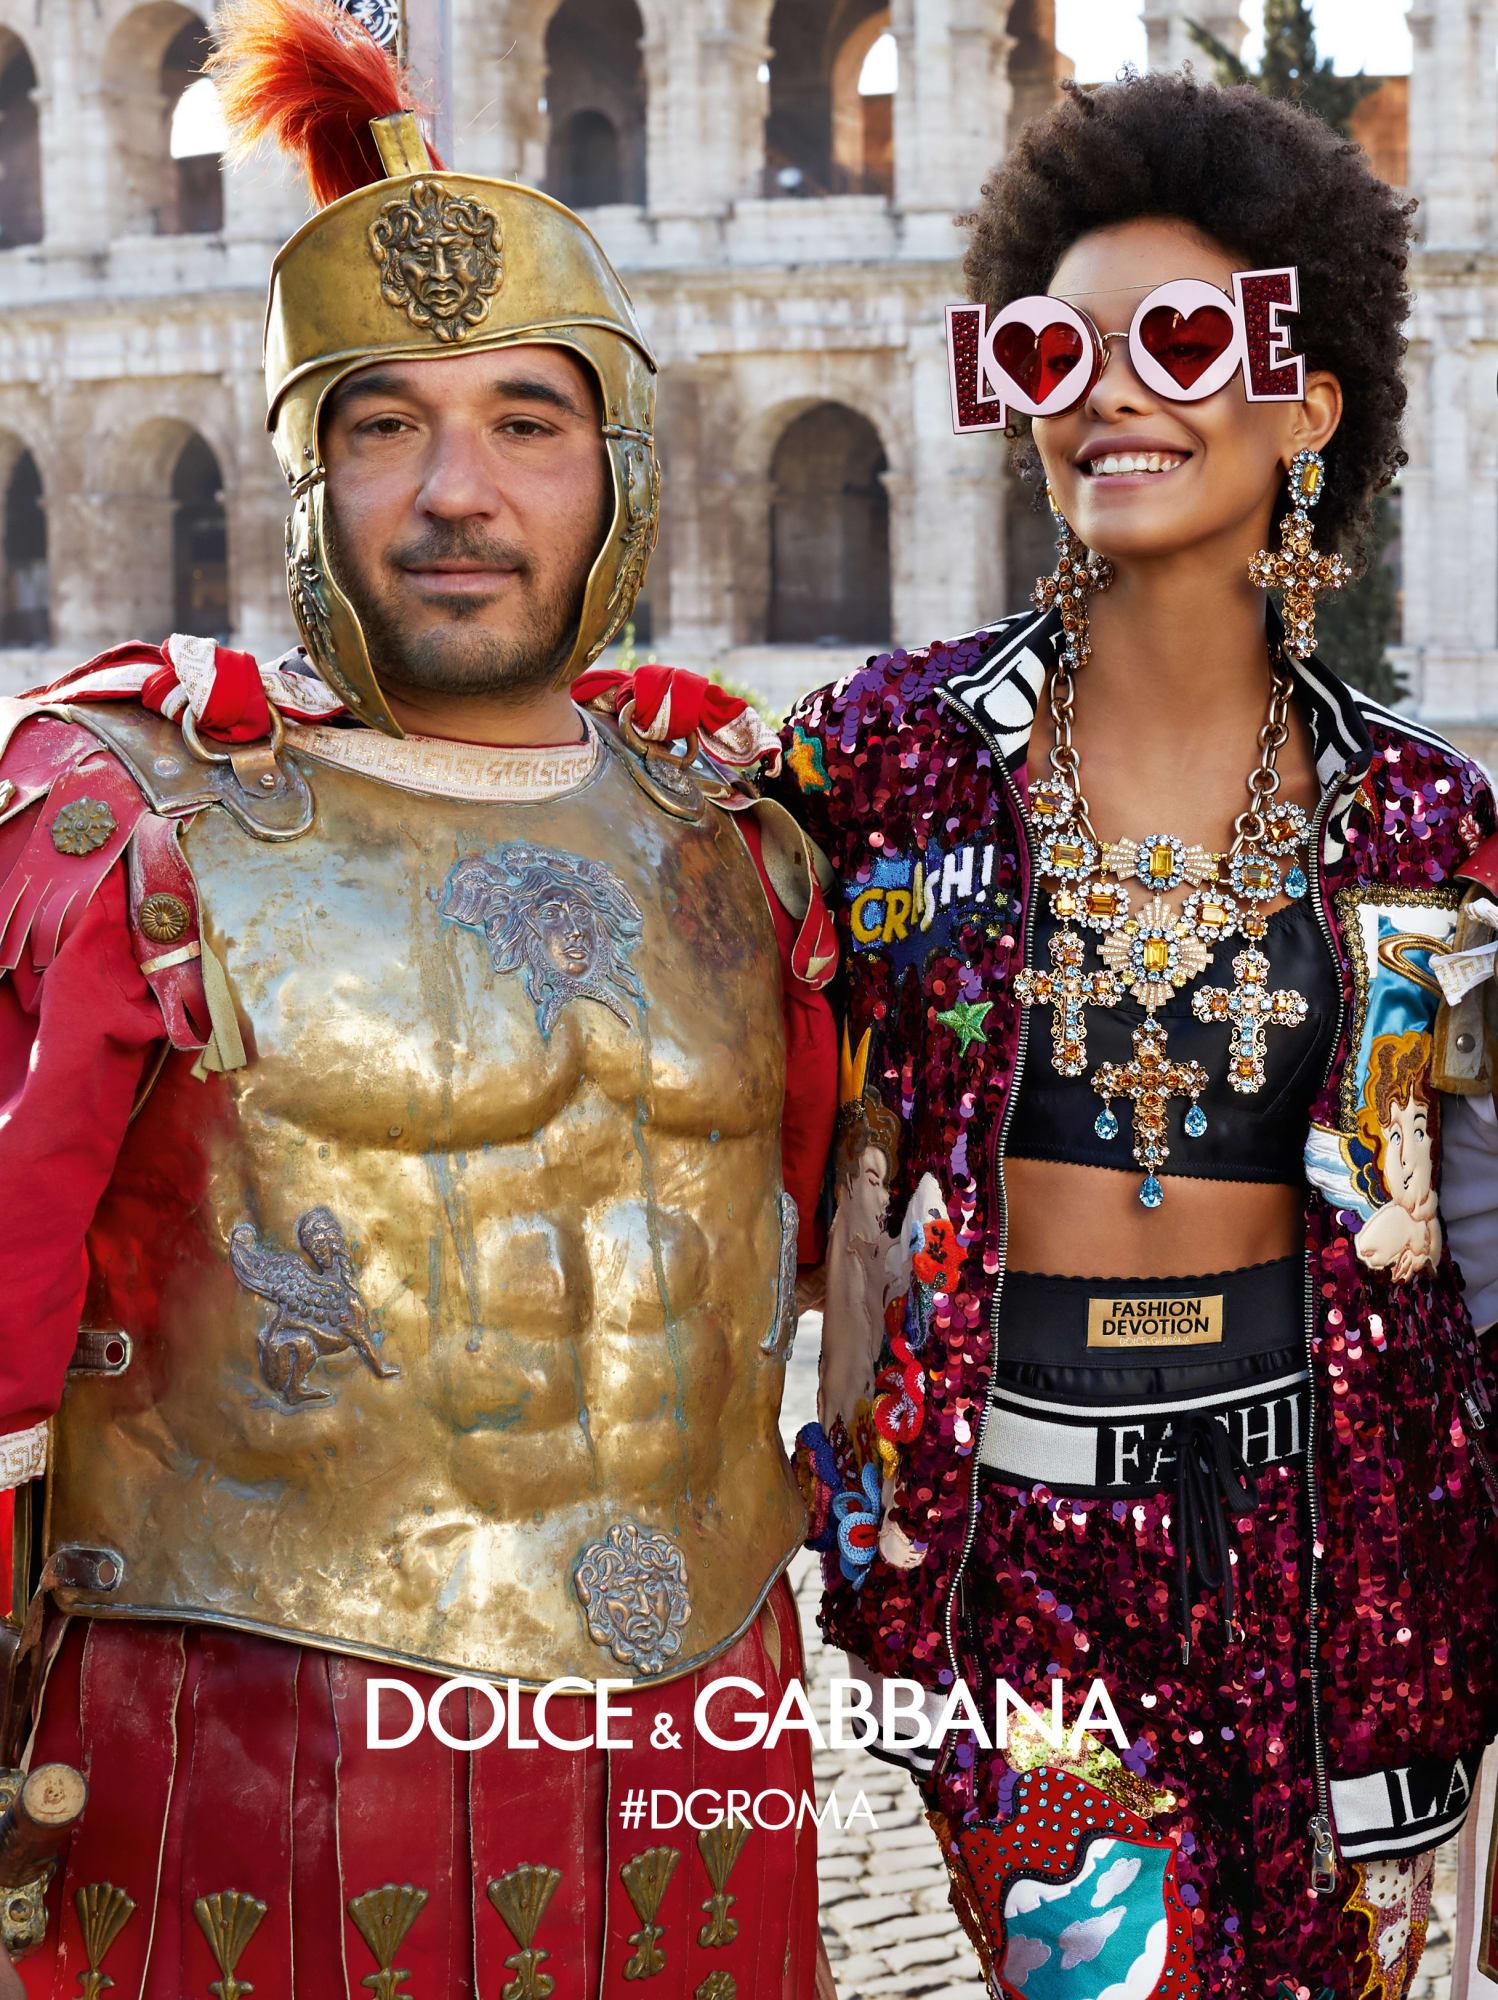 Dolce & Gabbana Fall 2018 Campaign